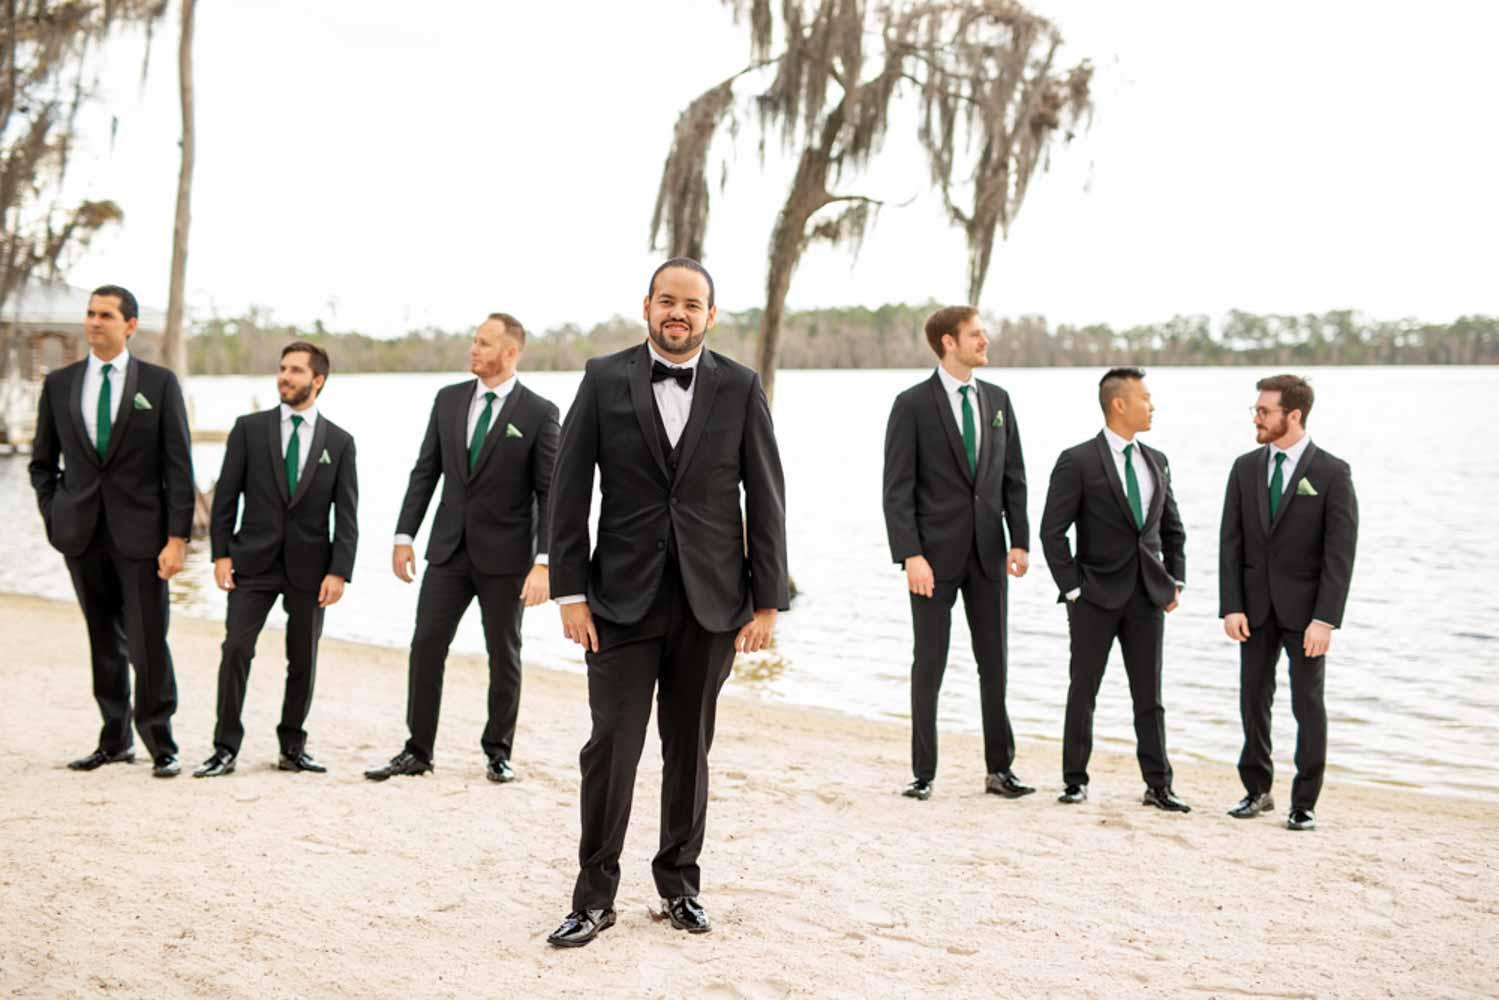 groom with groomsmen on beach a Paradise Cove